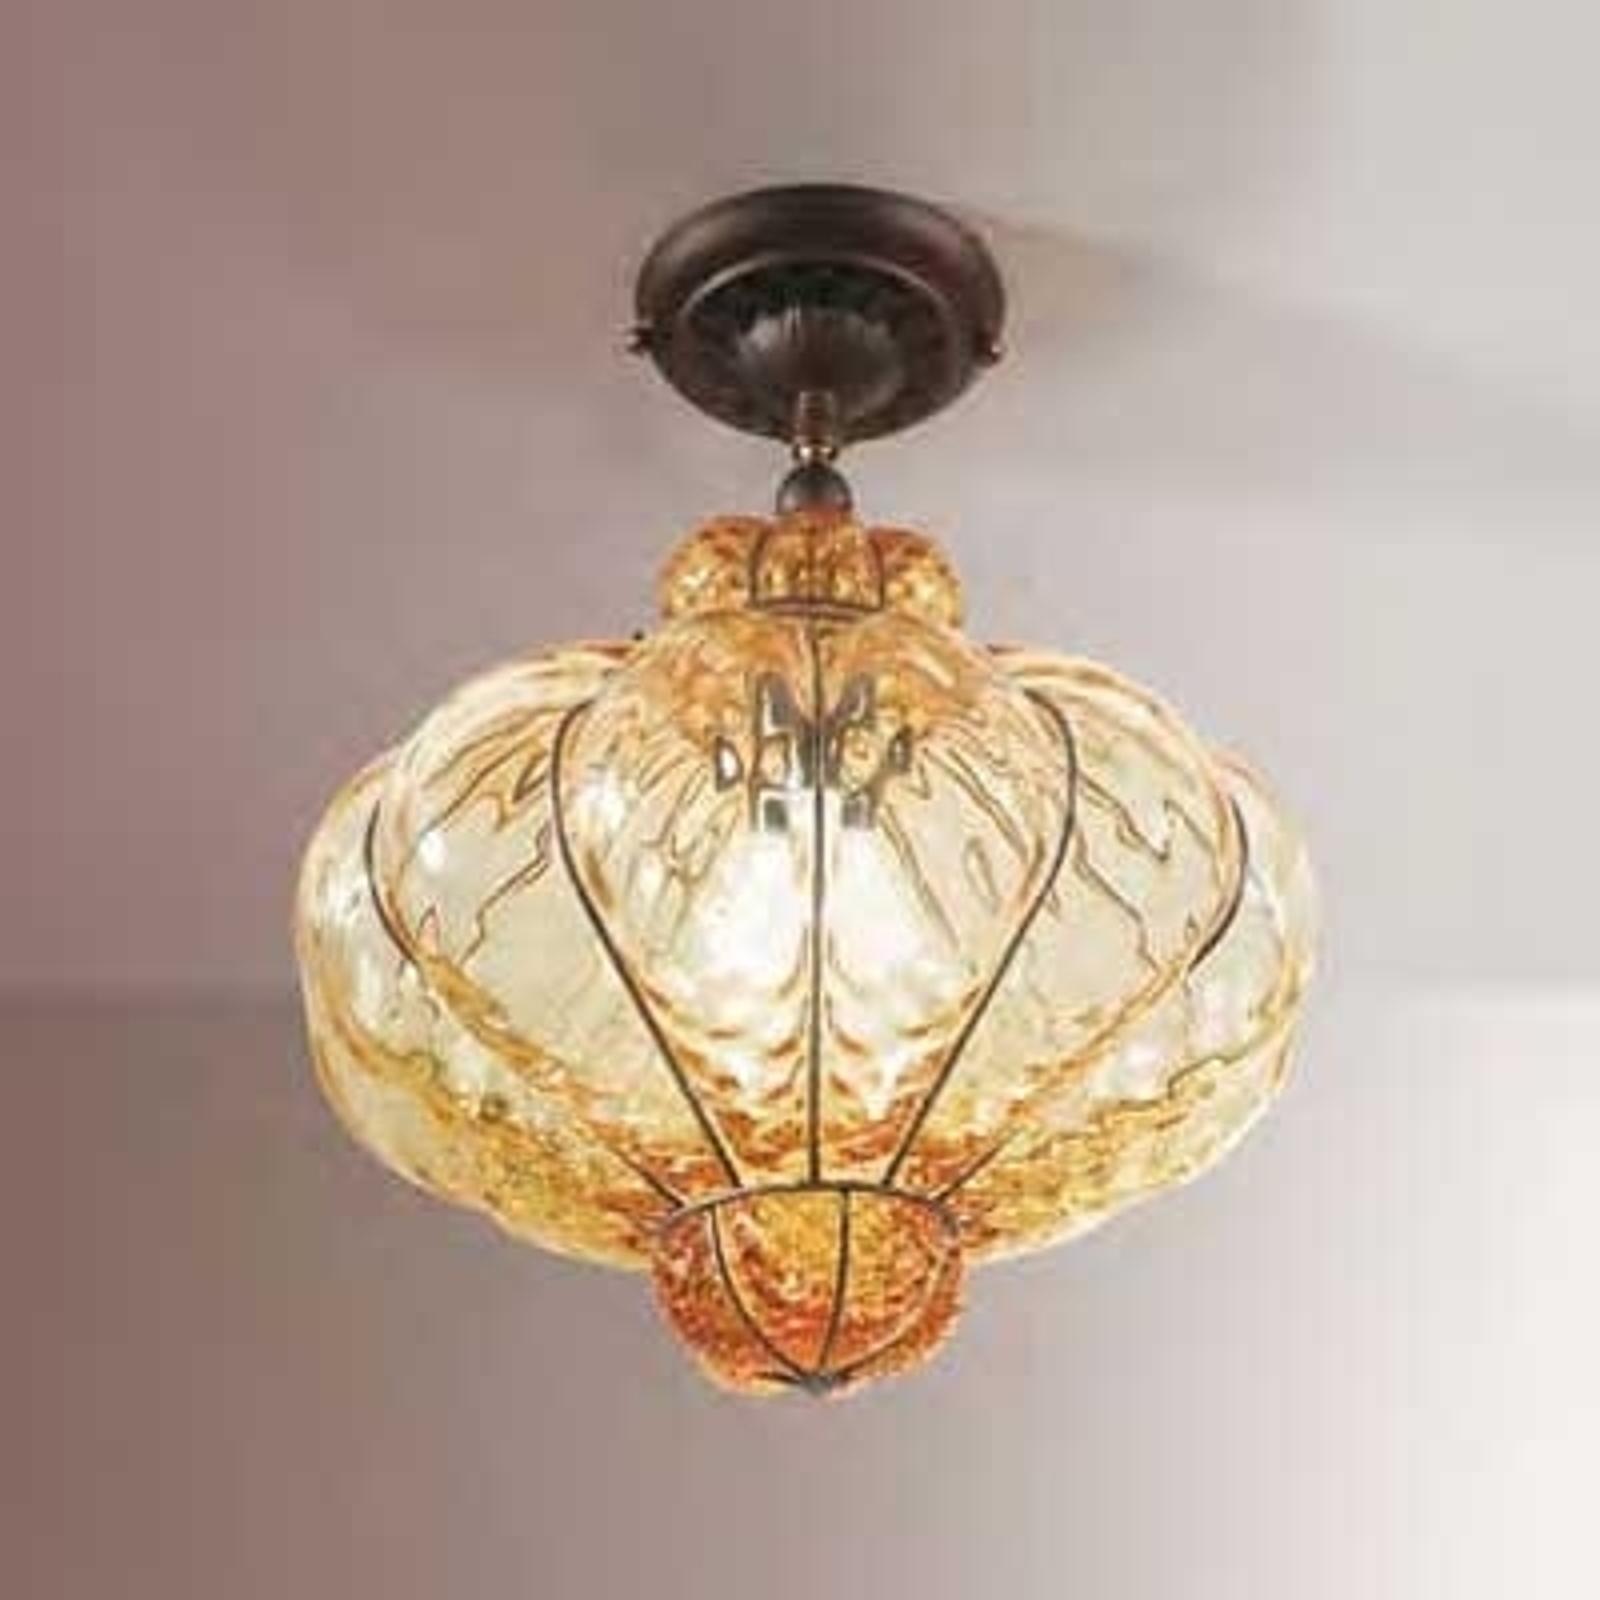 Lampa sufitowa SULTANO ze szkła Murano 37 cm